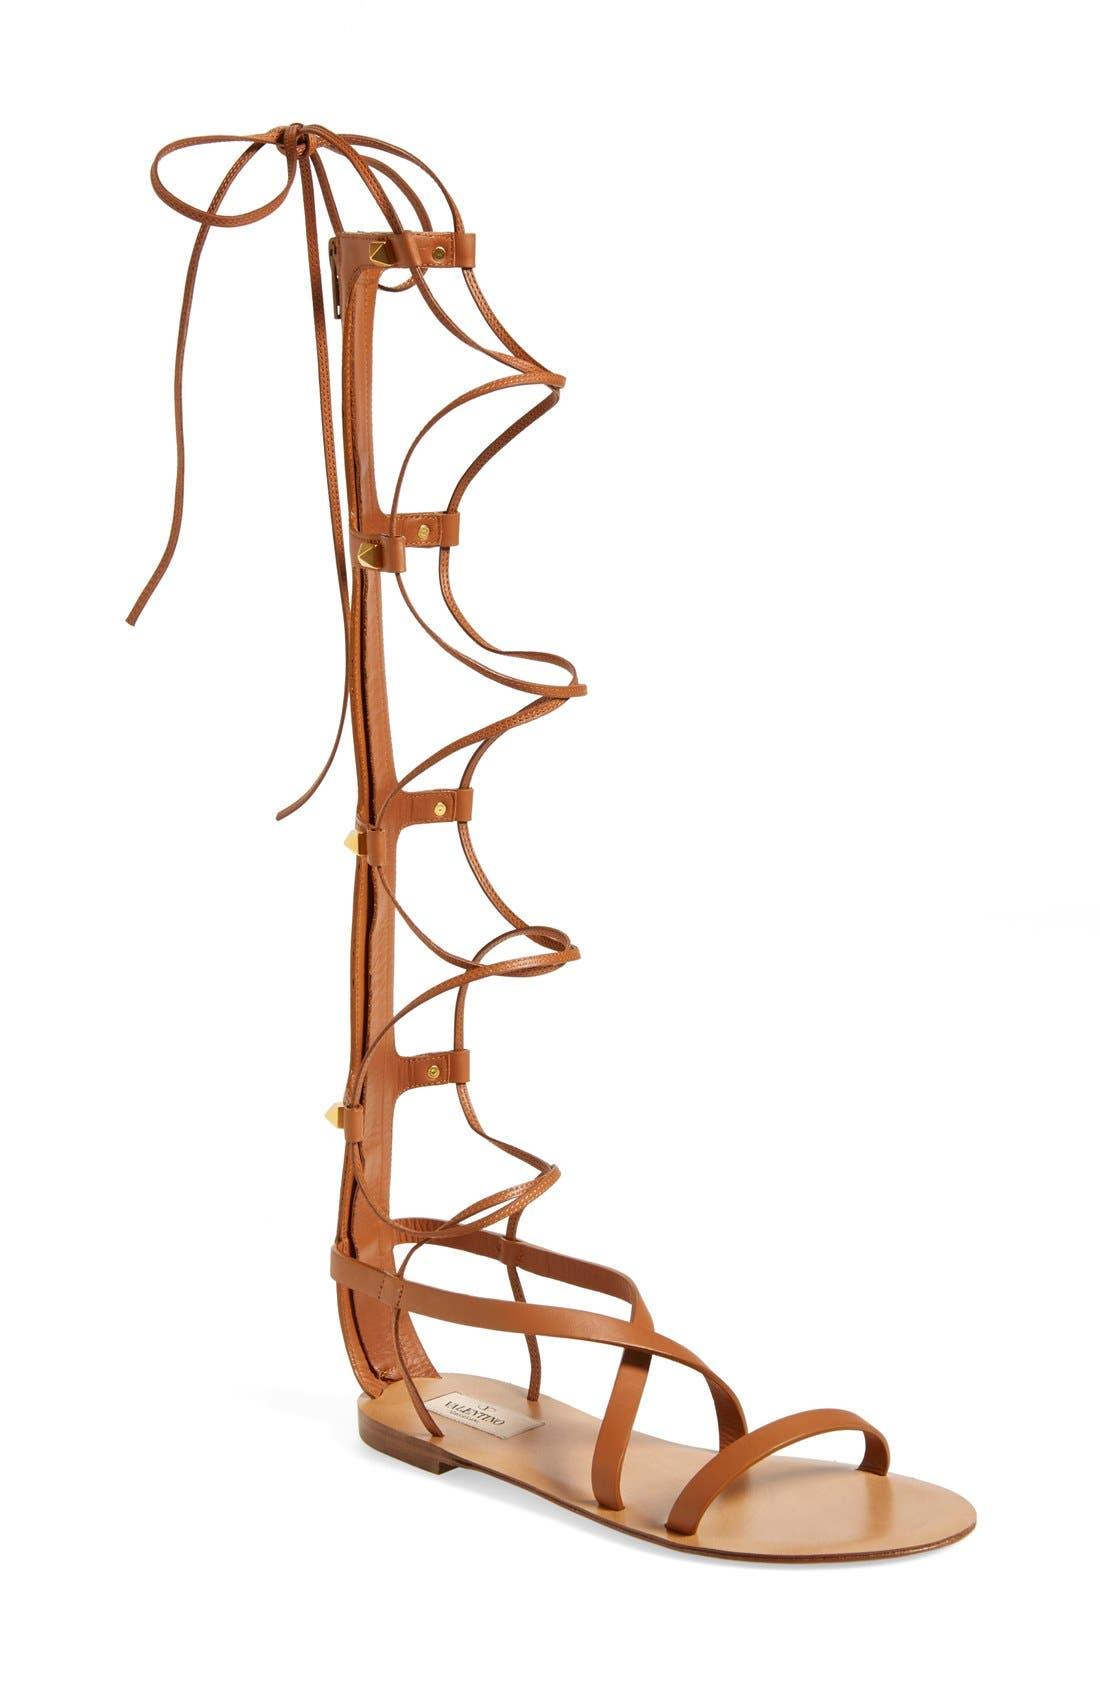 Main Image - Valentino 'Rockstud' Tall Gladiator Sandal (Women)